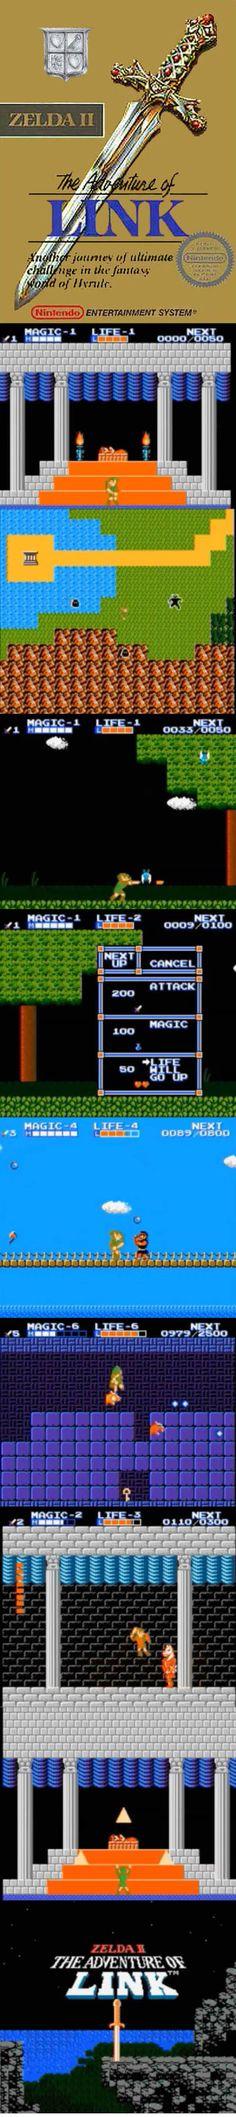 Link returns to rescue a new princess Zelda! Classic Rpg, Gamer News, Neo Geo, Sega Dreamcast, Classic Video Games, Retro Gamer, We Are Young, Sega Genesis, Legend Of Zelda